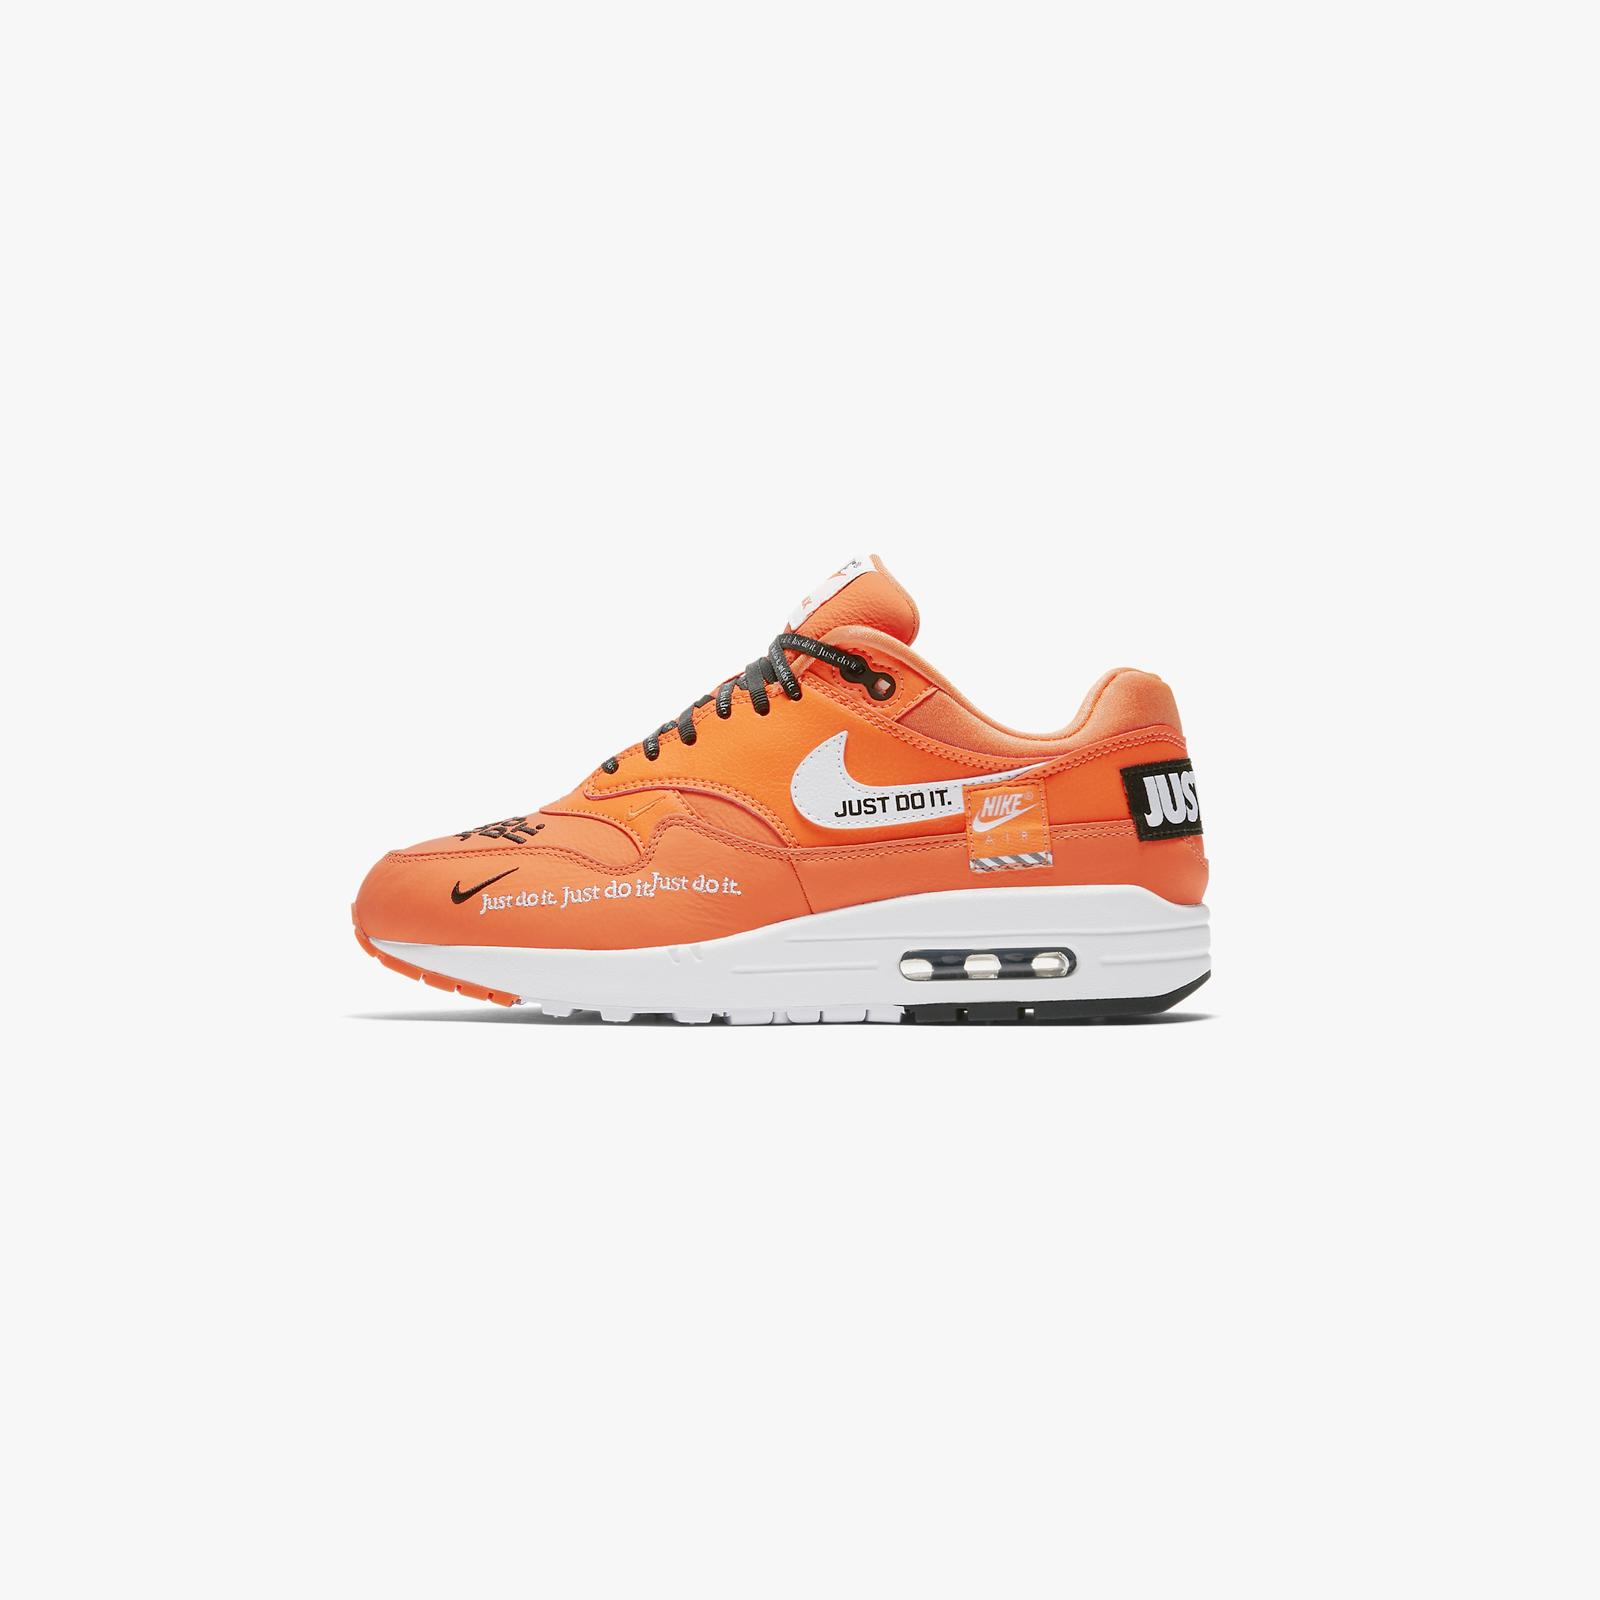 1f8782df32 Nike Wmns Air Max 1 LX Just Do It - 917691-800 - Sneakersnstuff   sneakers  & streetwear online since 1999